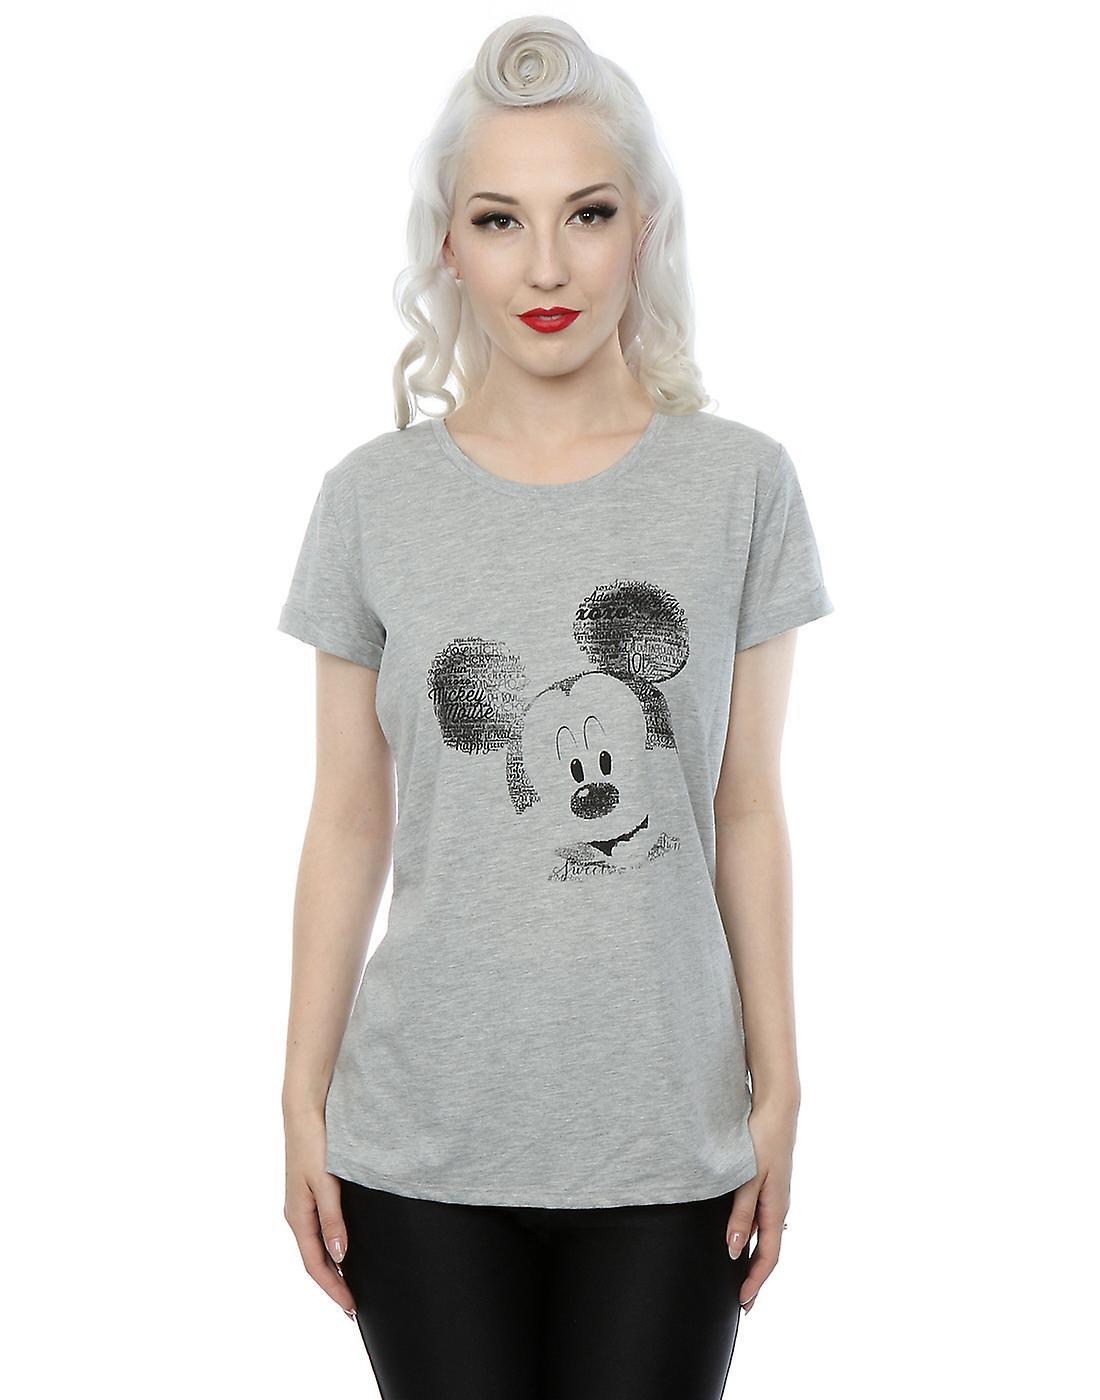 27a3174d Disney Women's Mickey Mouse Text Face Roll Sleeve T-Shirt | Fruugo